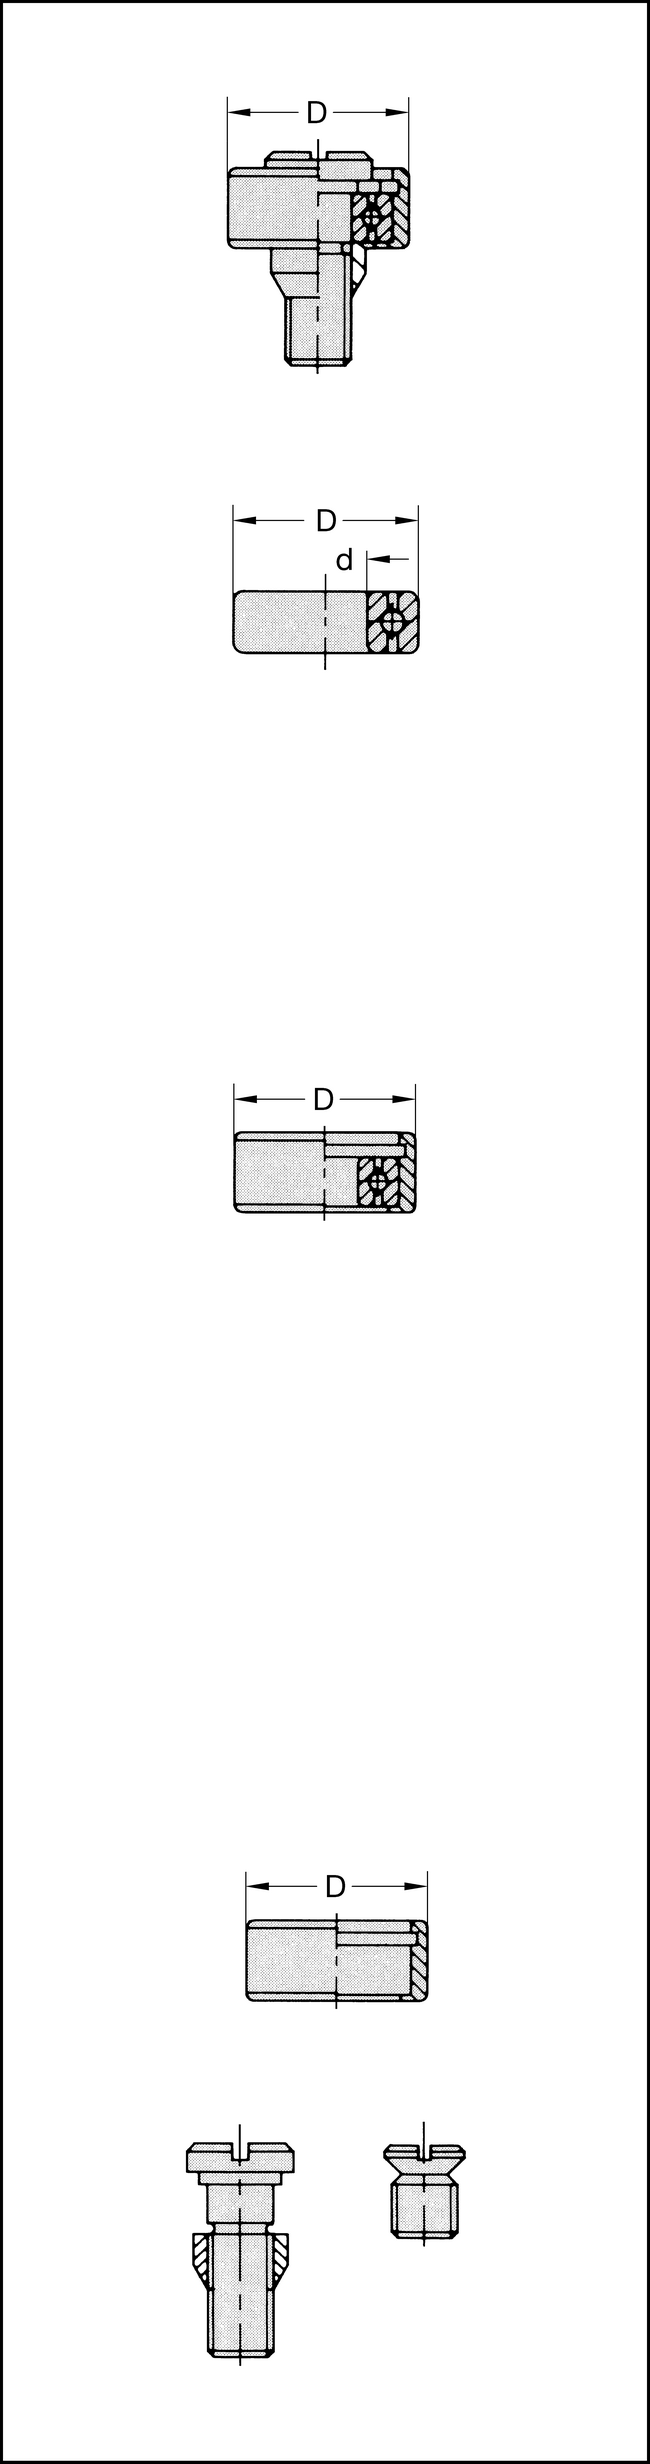 Kugellager 10x4mm d=4mm